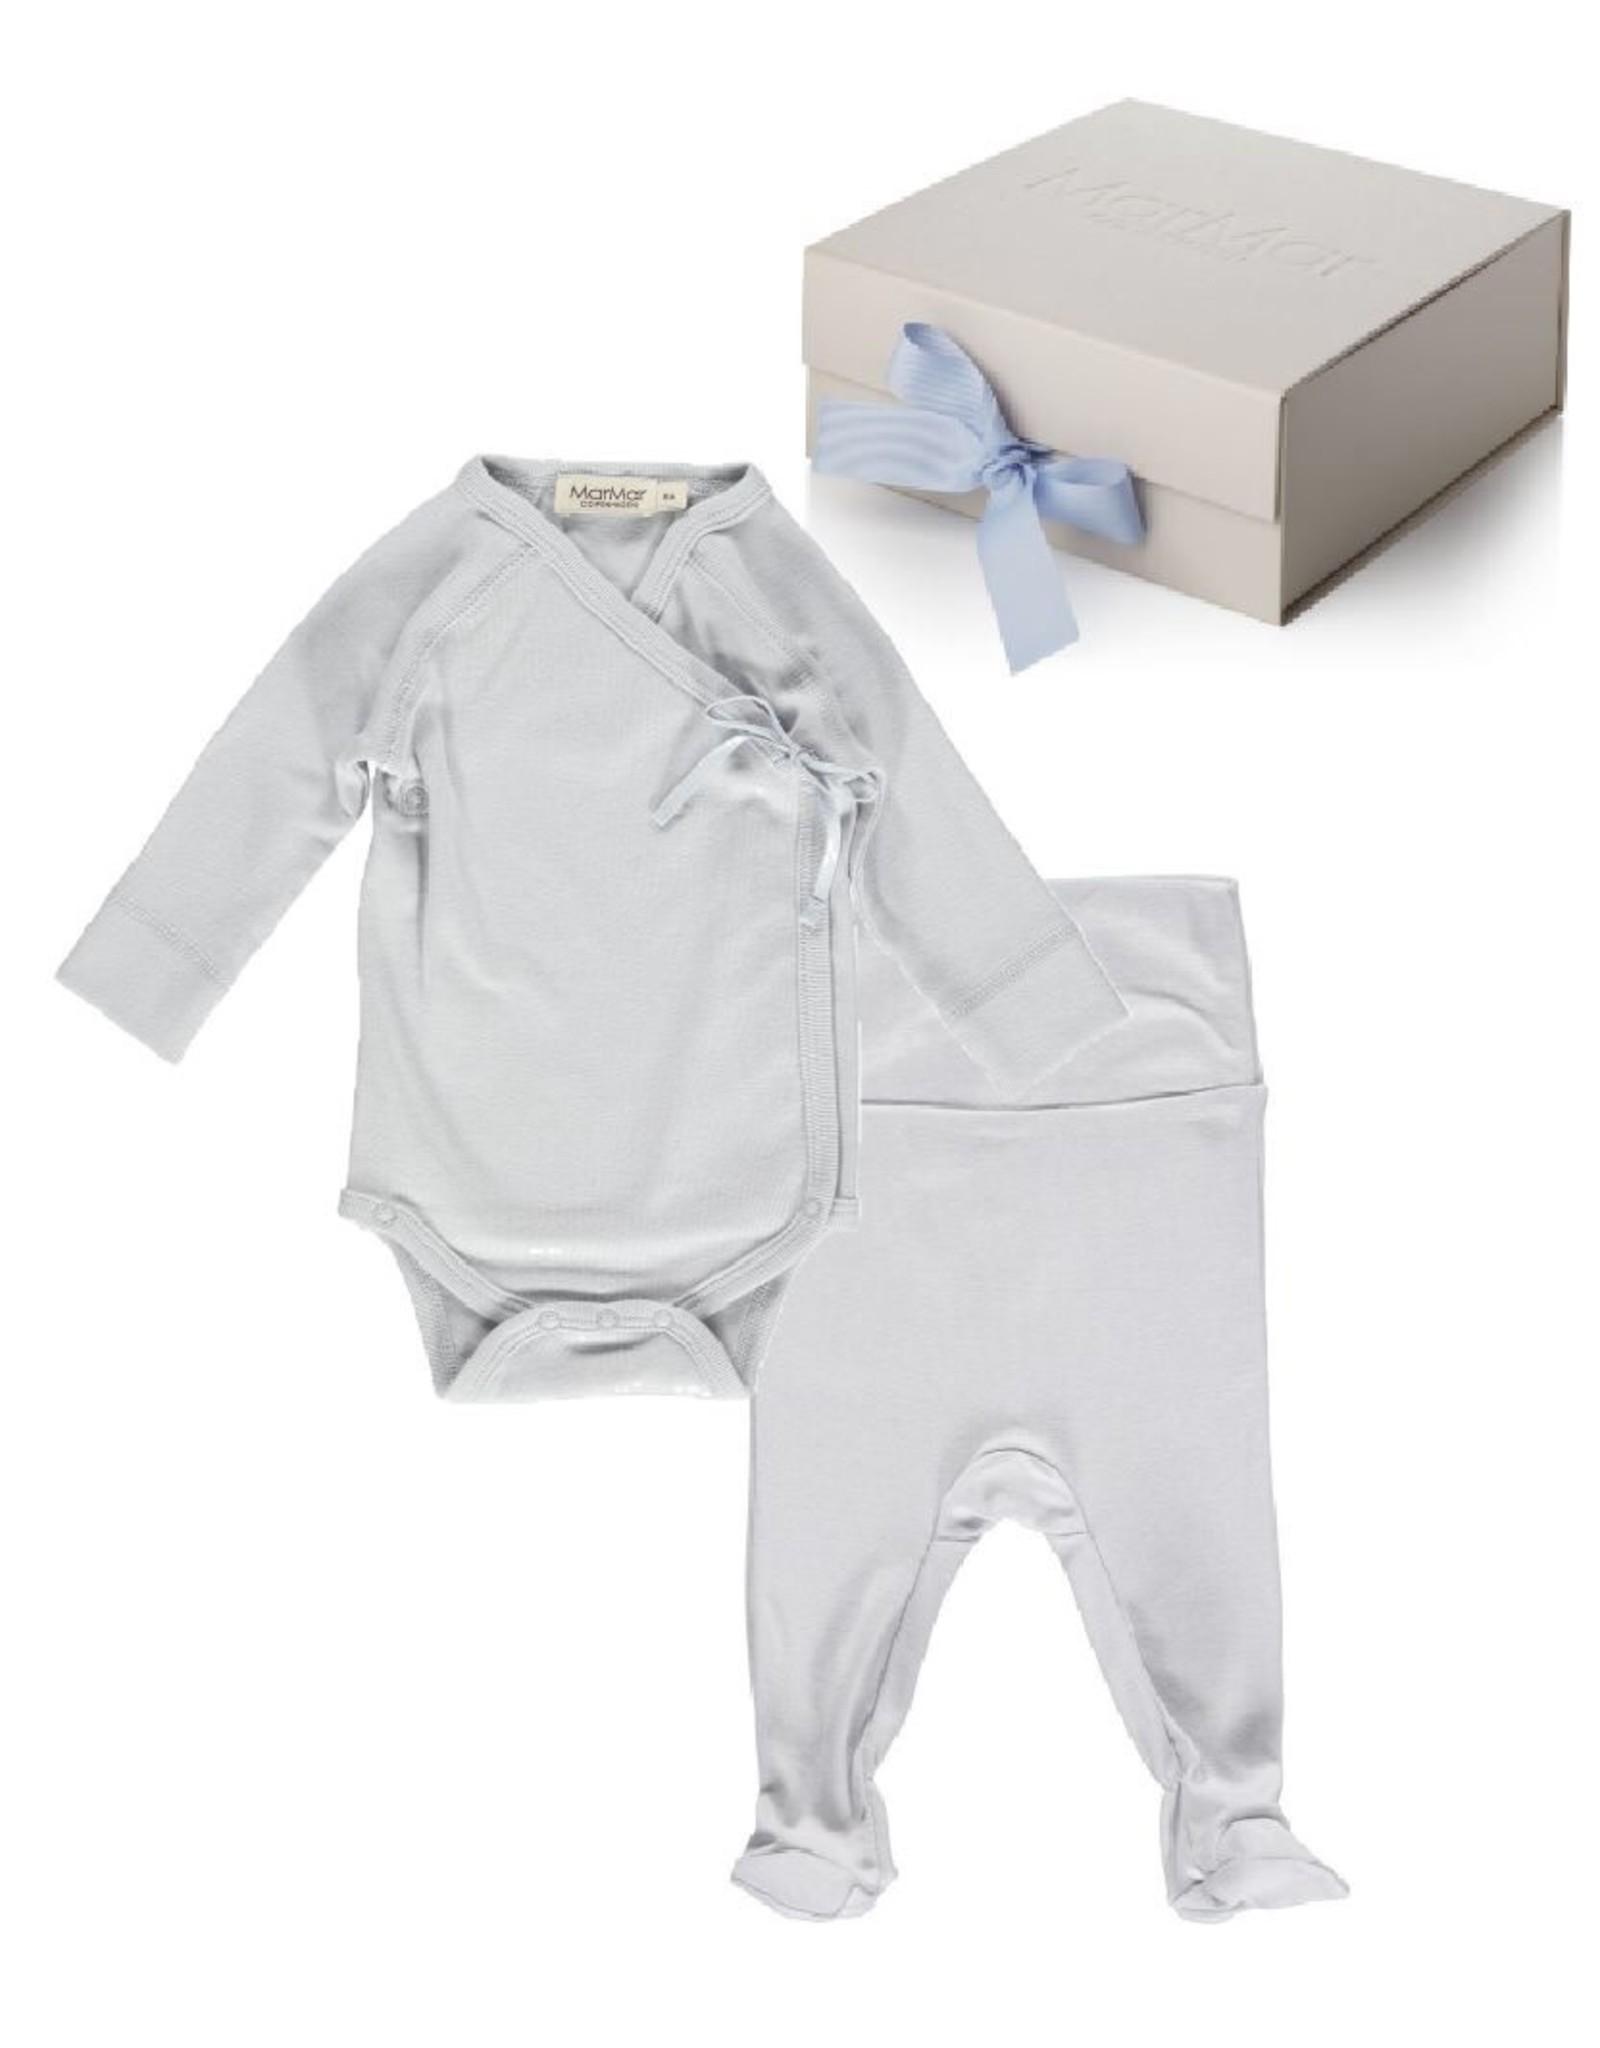 MARMAR COPENHAGEN Pale Blue Gift Box